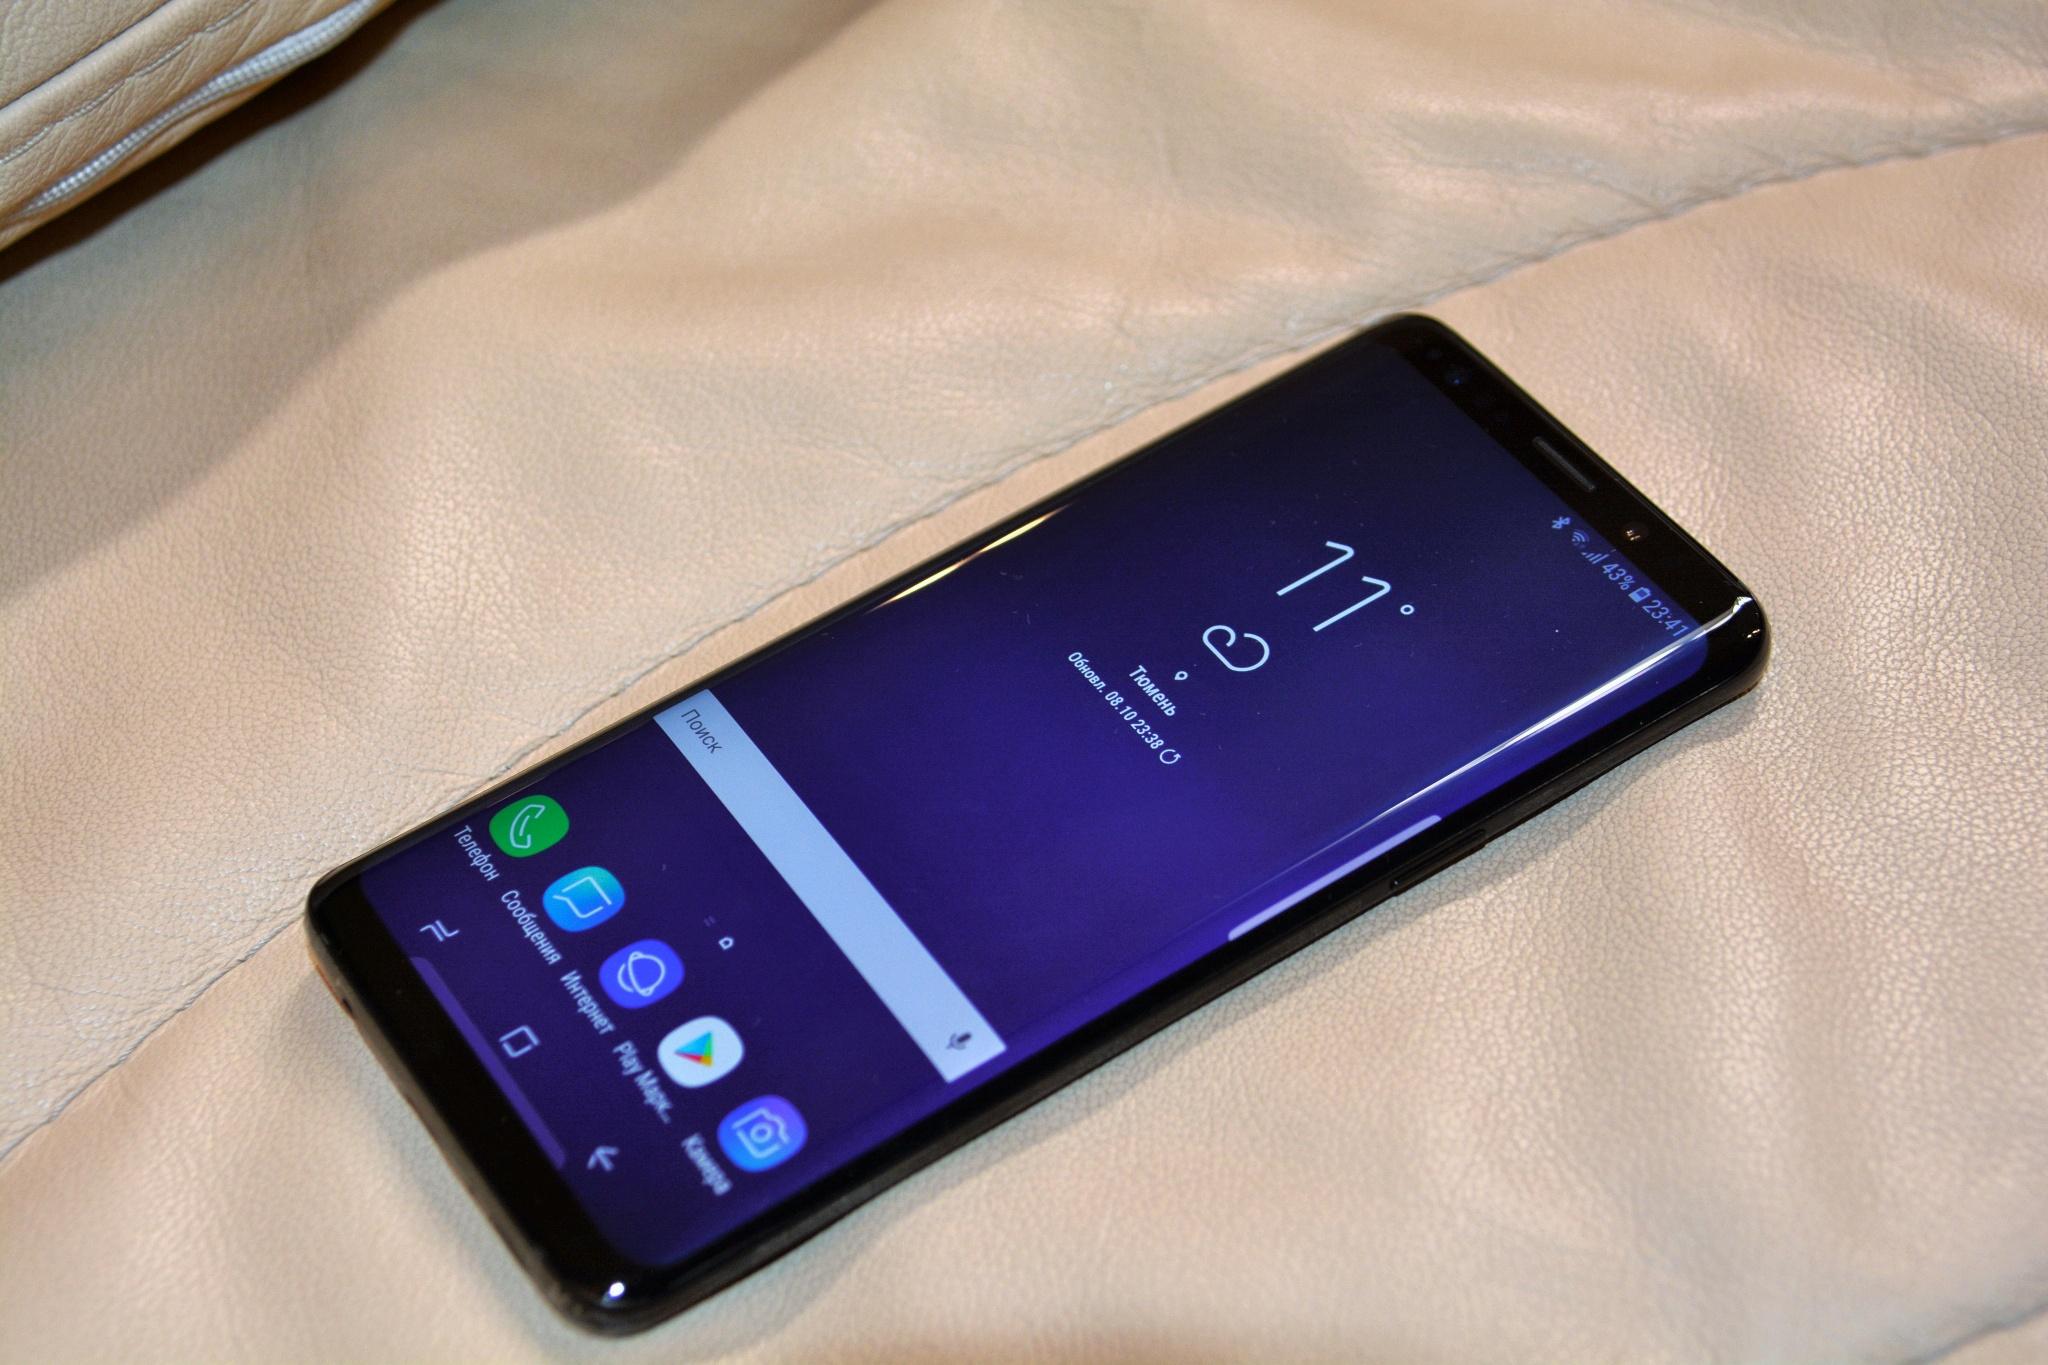 73b079692f4 Обзор на Смартфон Samsung Galaxy S9 SM-G960F 64Gb черный бриллиант -  изображение 1